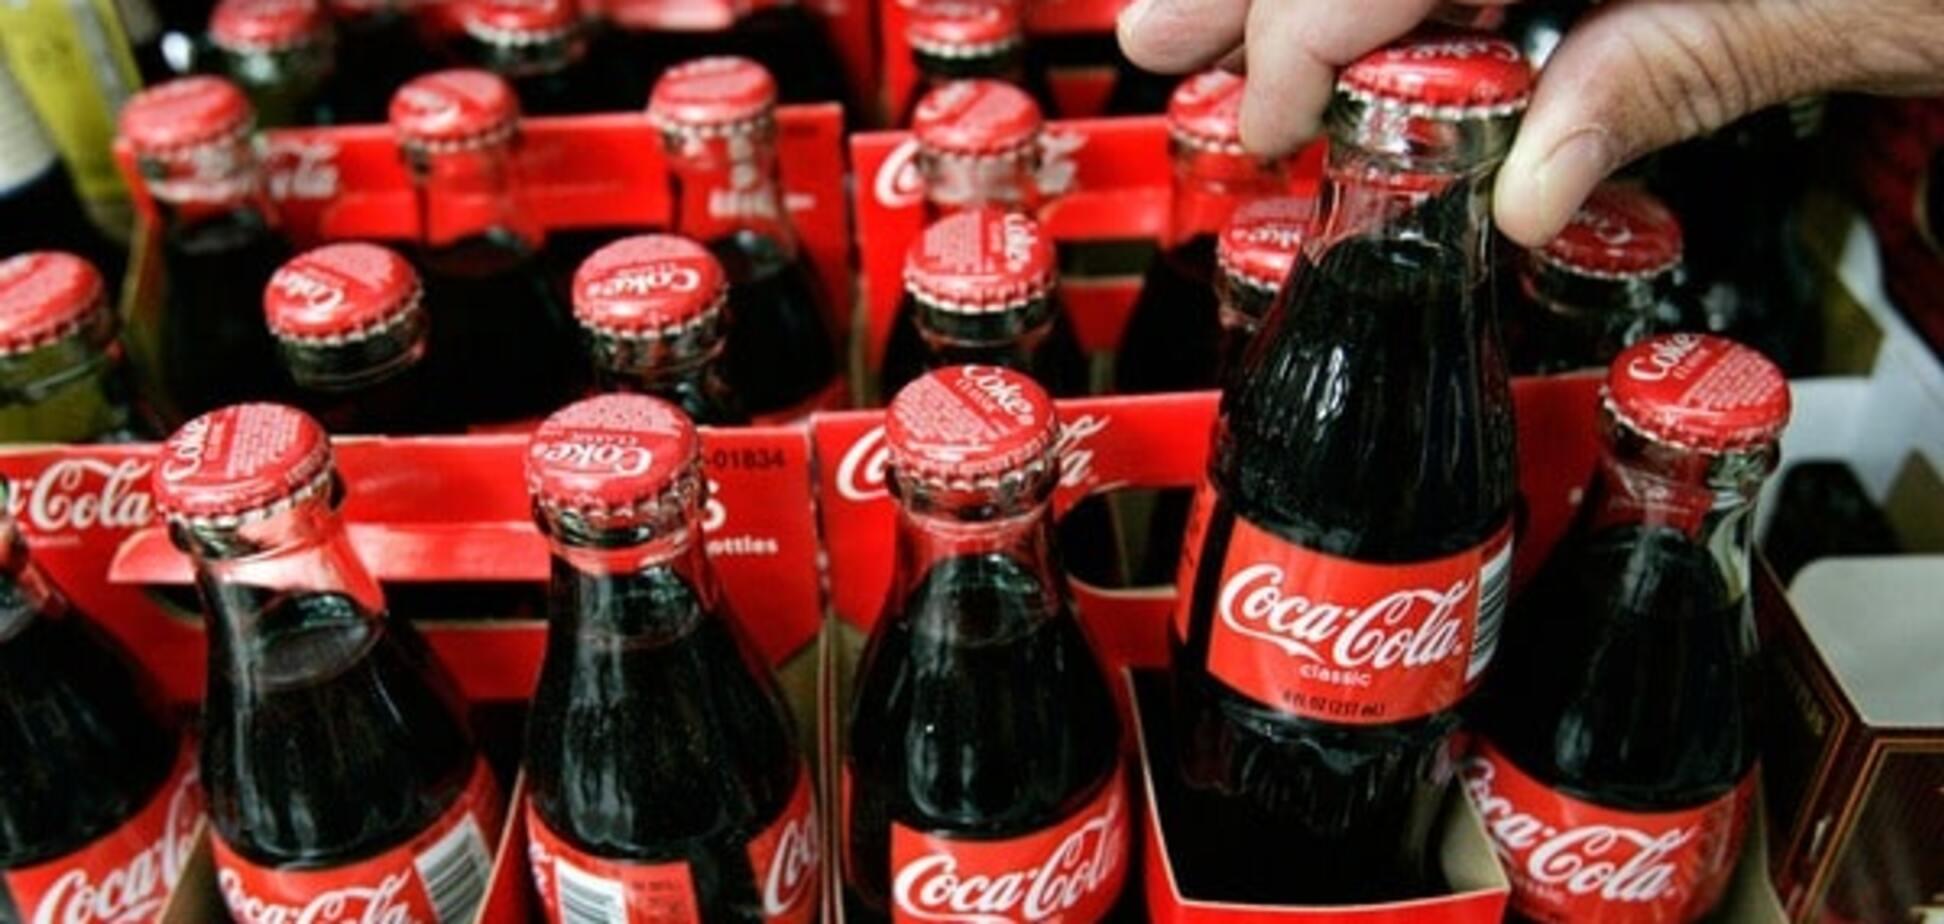 Образилися: окупанти Криму теж пригрозили Coca-Cola бойкотом